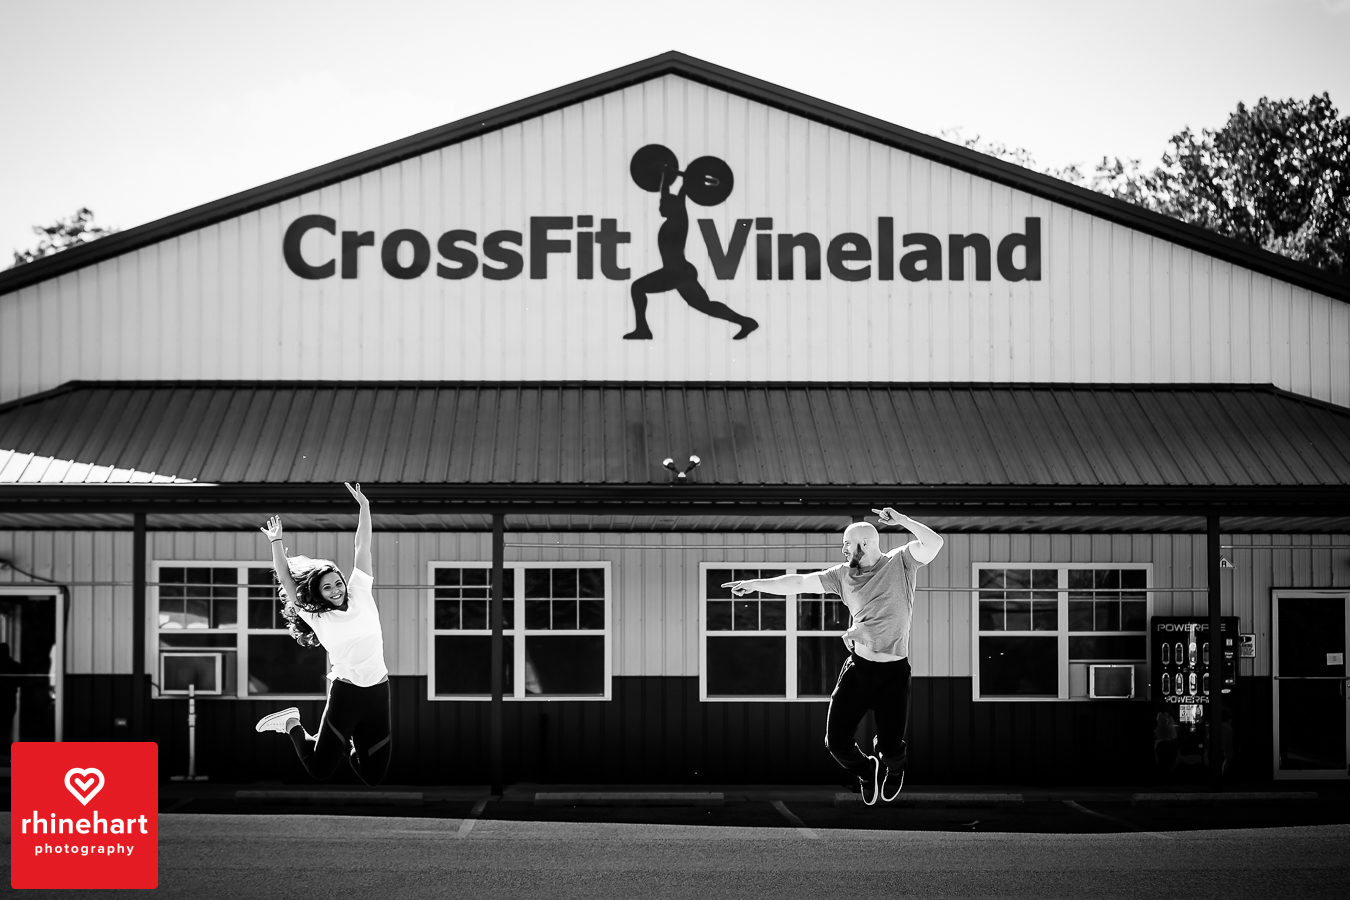 creative-engagement-photographers-crossfit-vineland-nj-ny-pa-md-unique-3